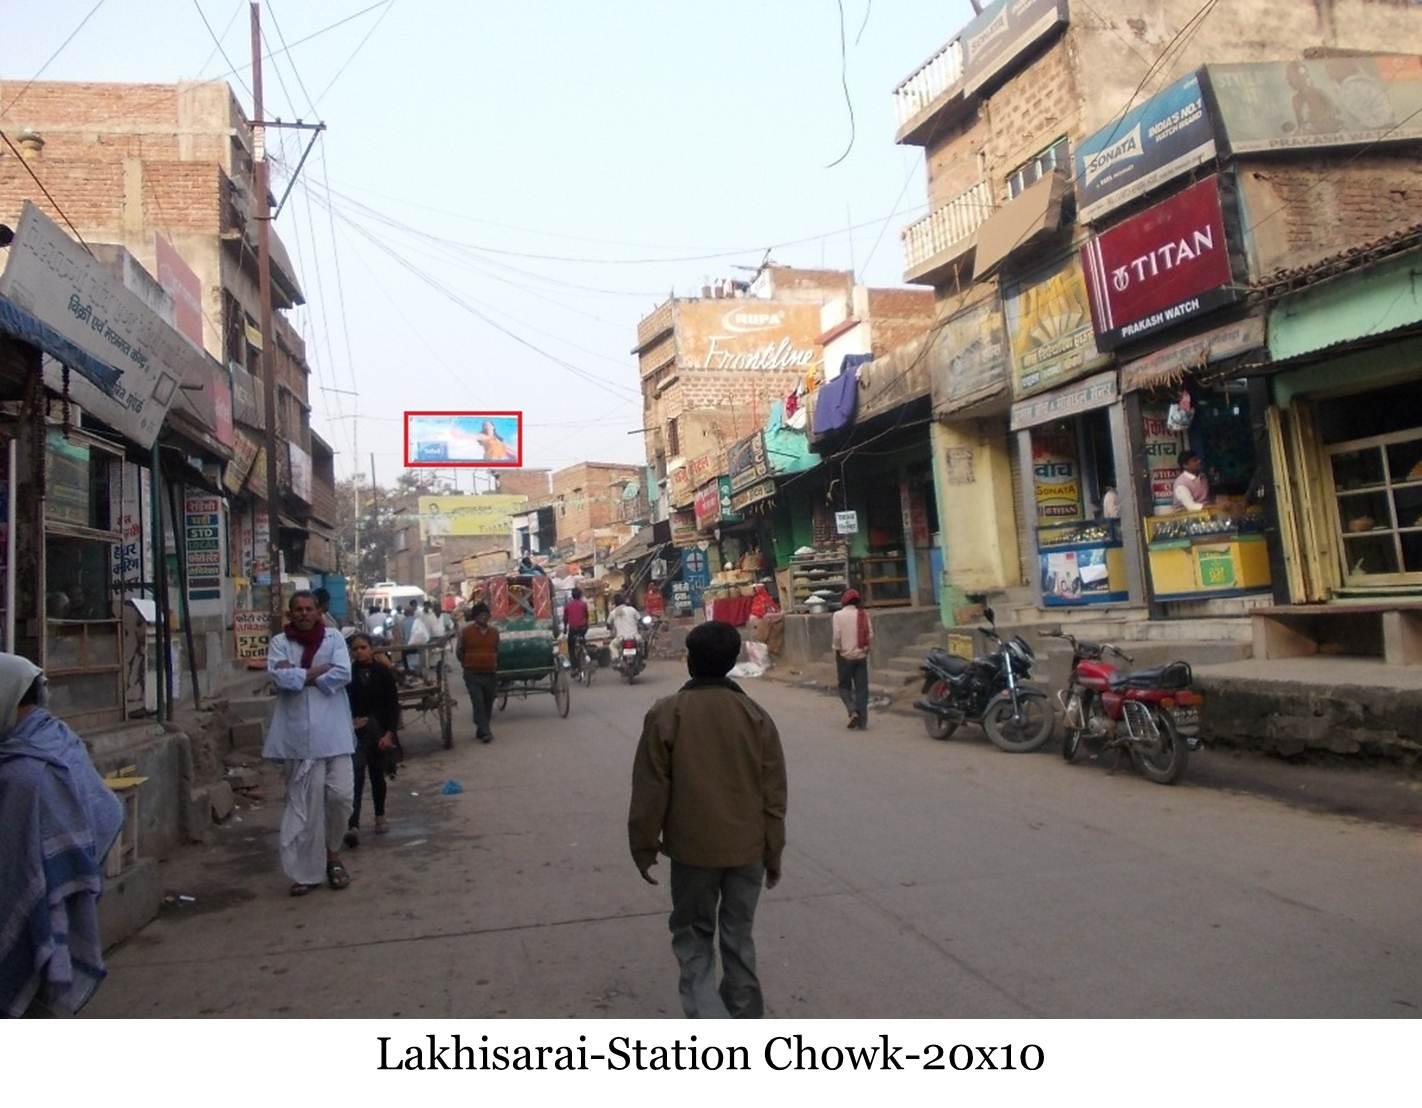 Station, Lakhisarai